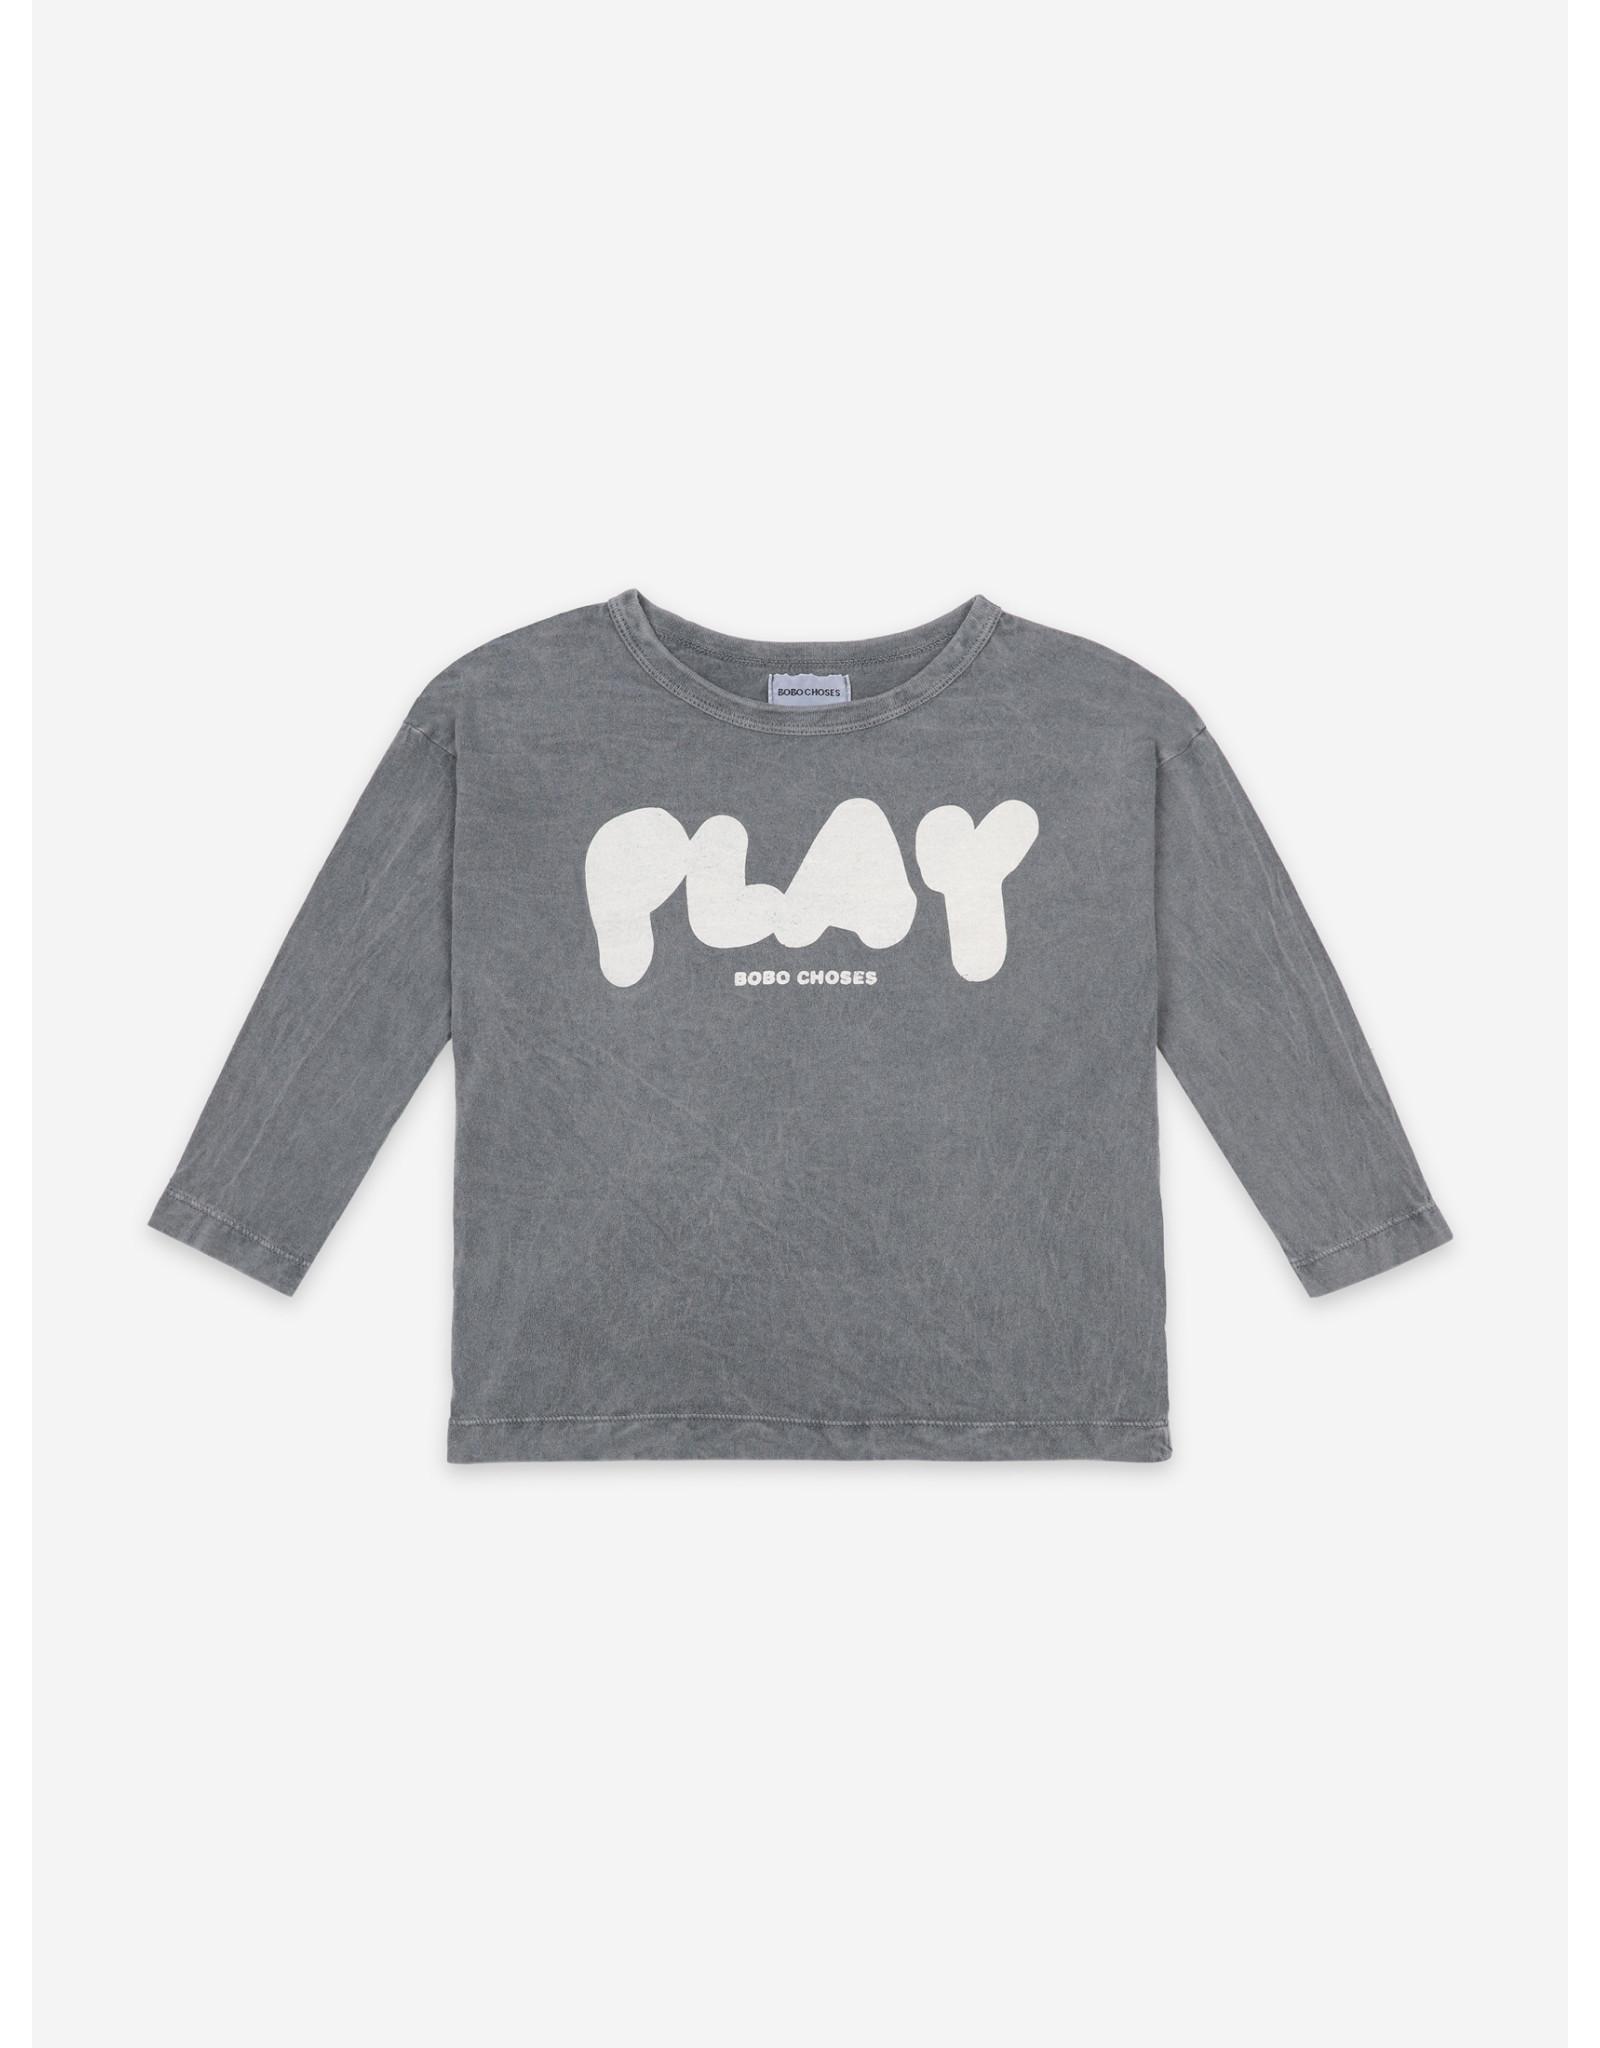 Bobo Choses Play Long Sleeve shirt